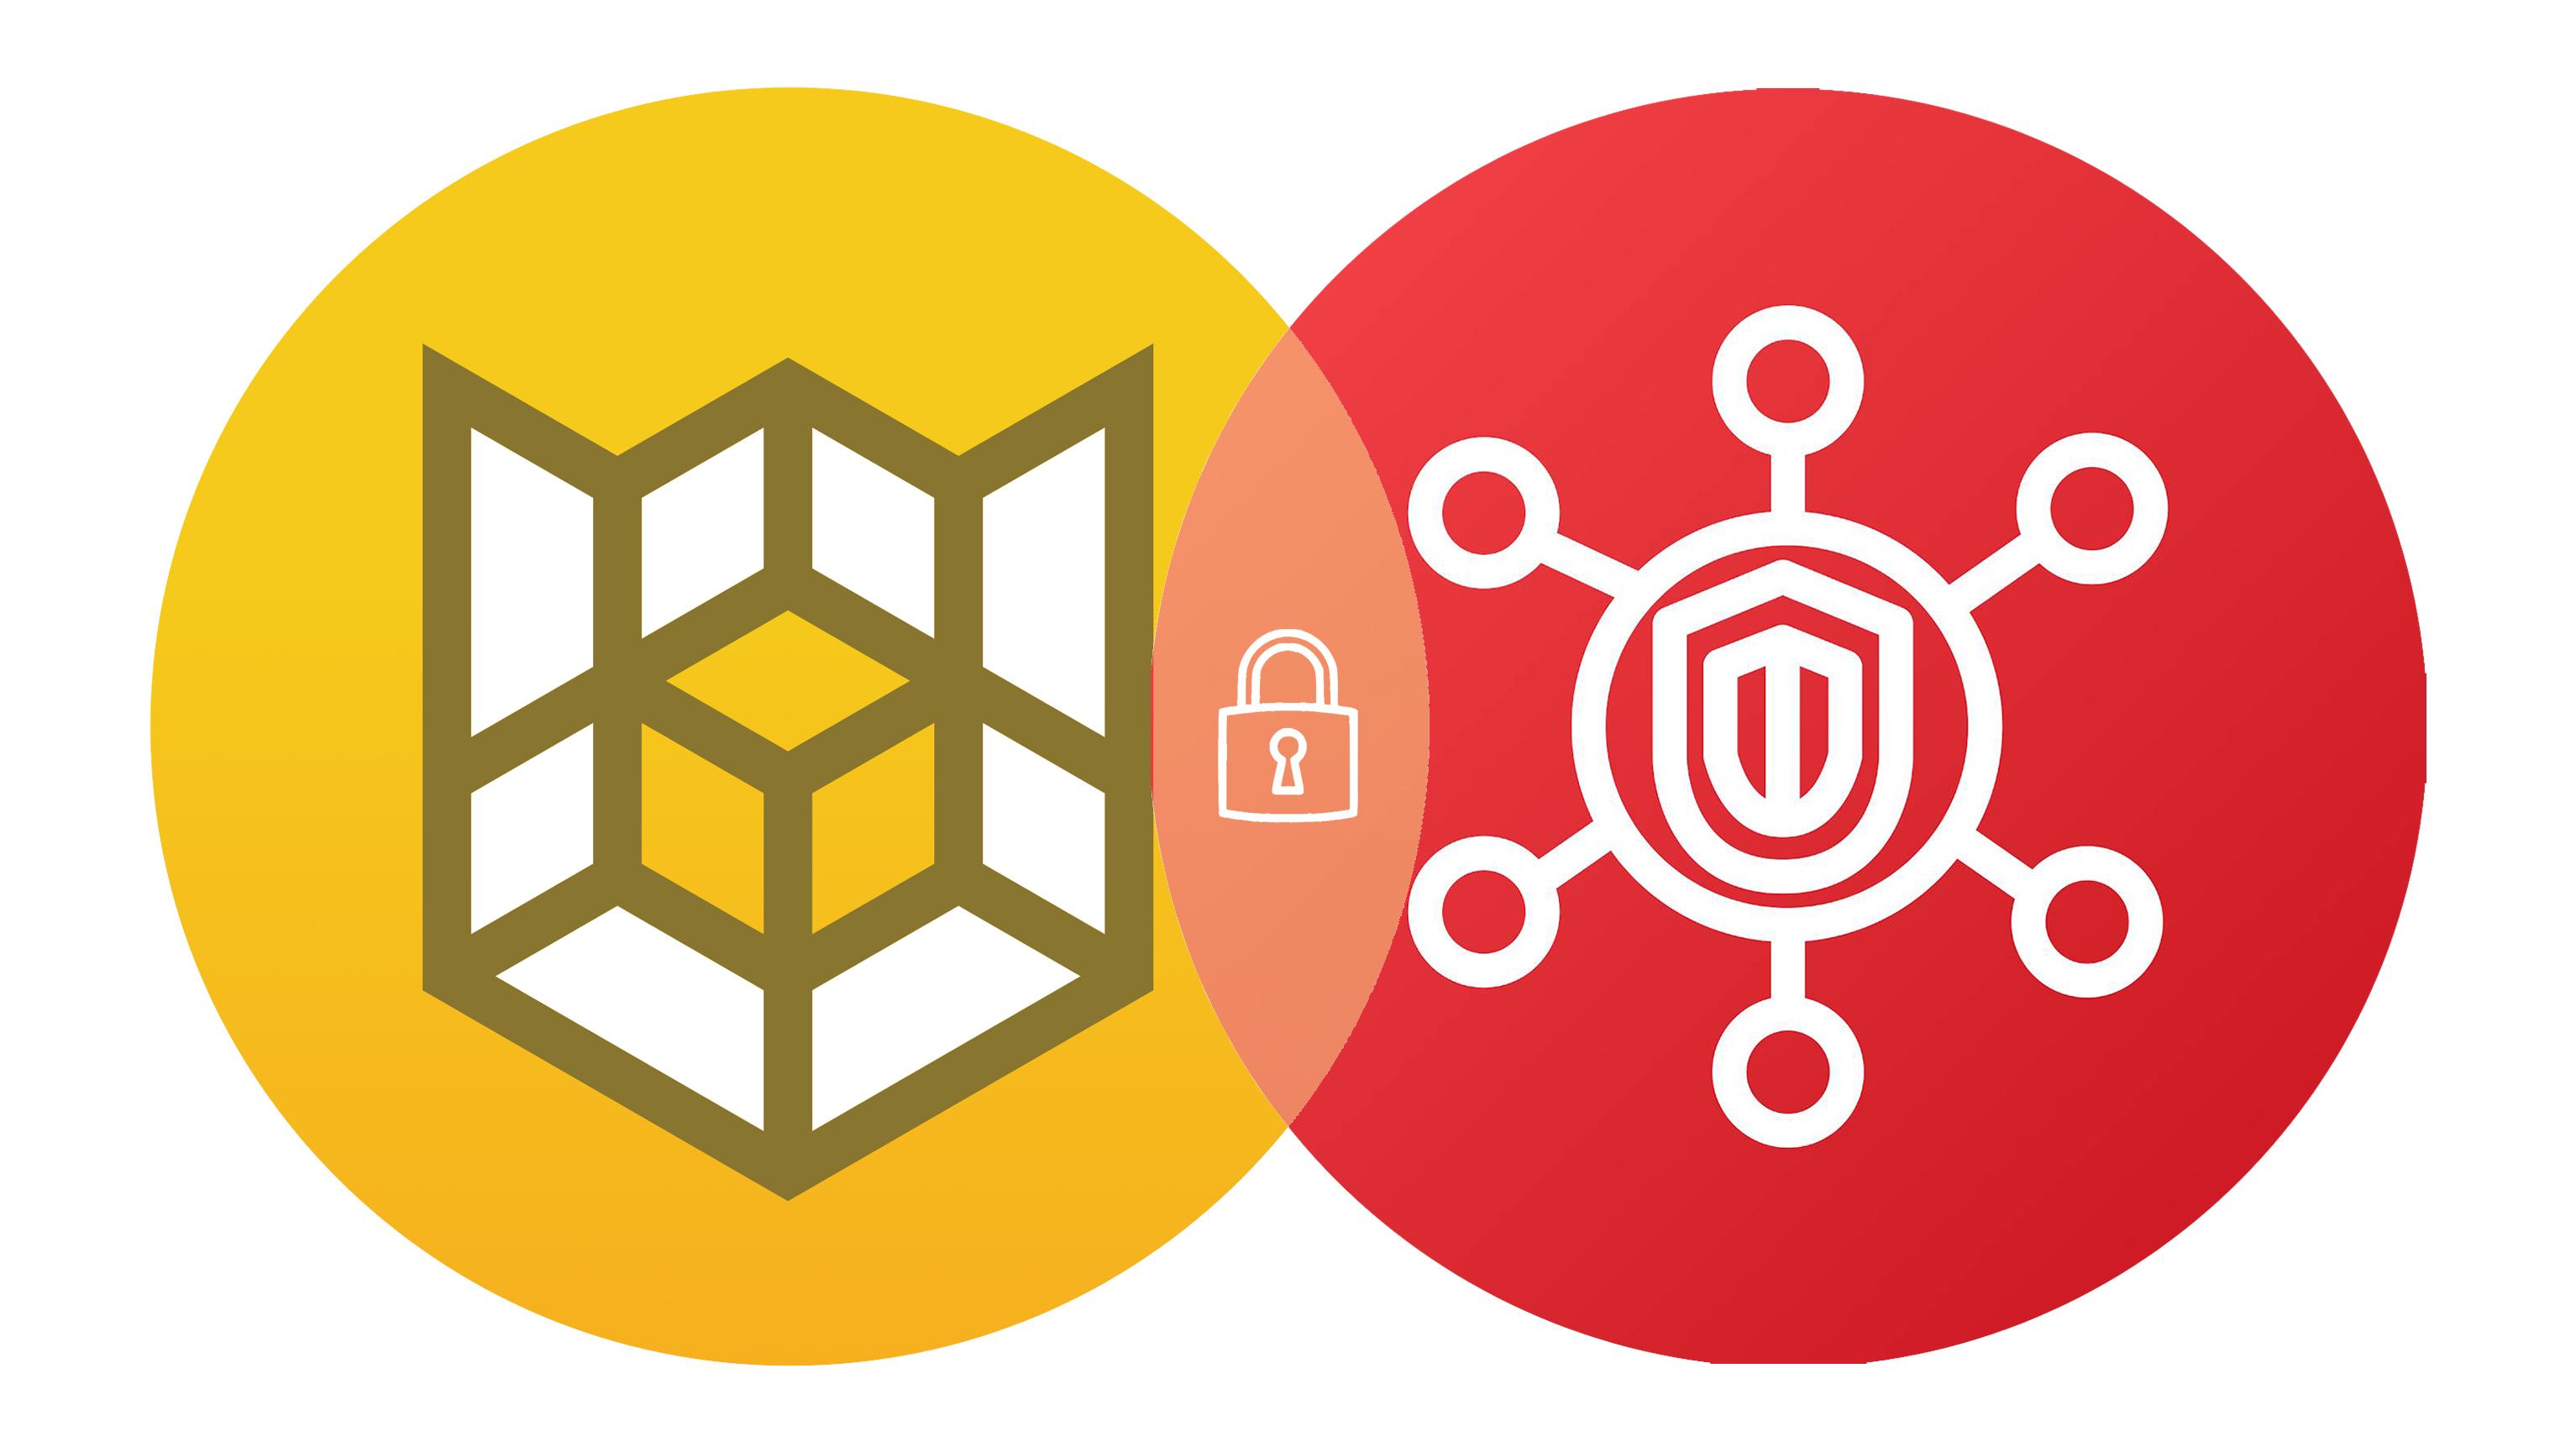 Circular Cloud Custodian and AWS Security Hub logos intersected like a Venn diagram